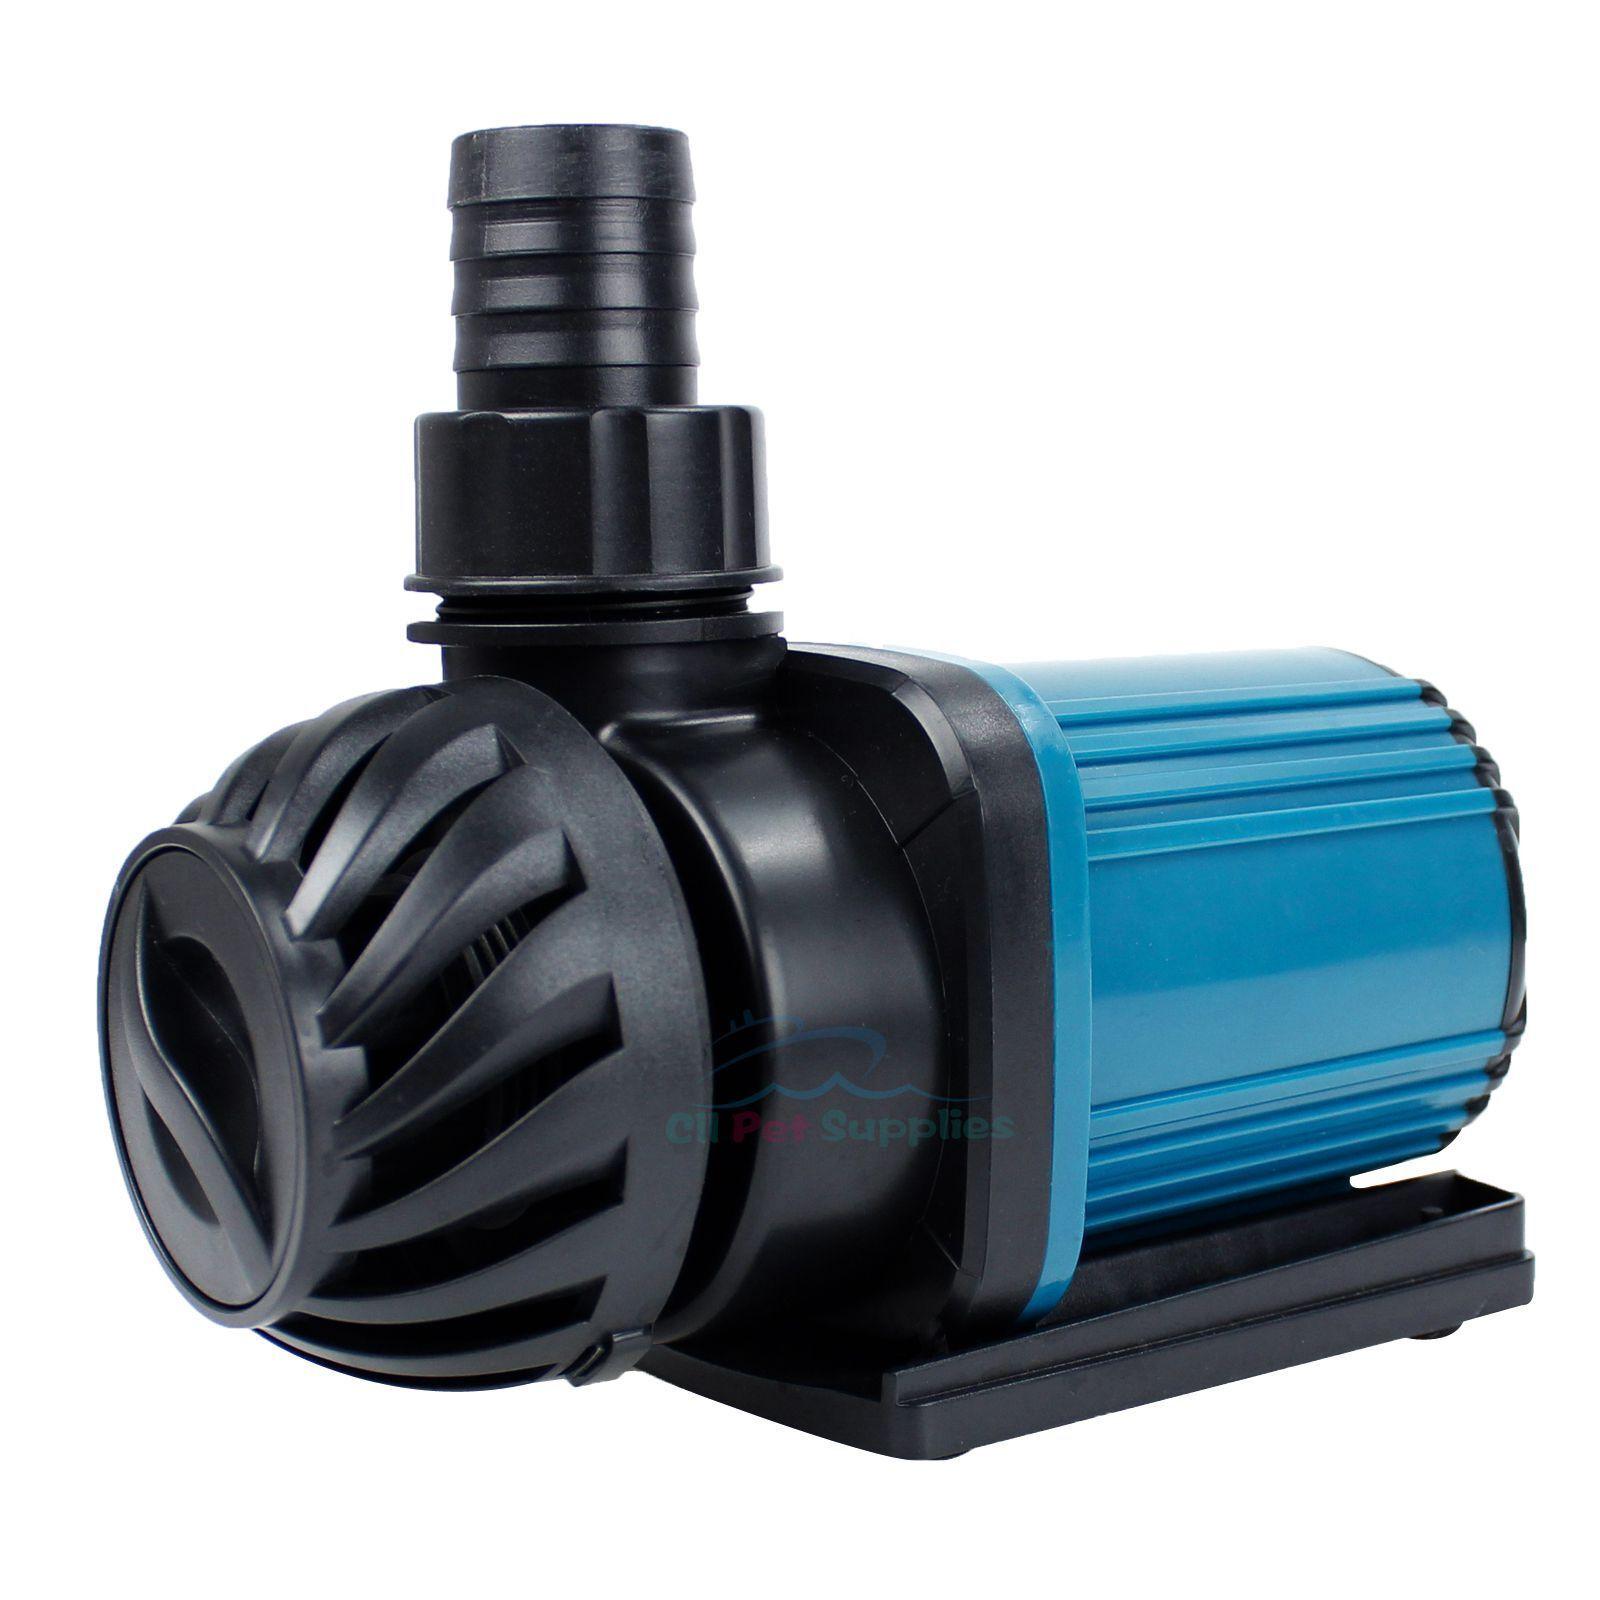 Aquarium 1200-3200GPH Pond Pump Fountain Submersible Inline Hydroponics 2